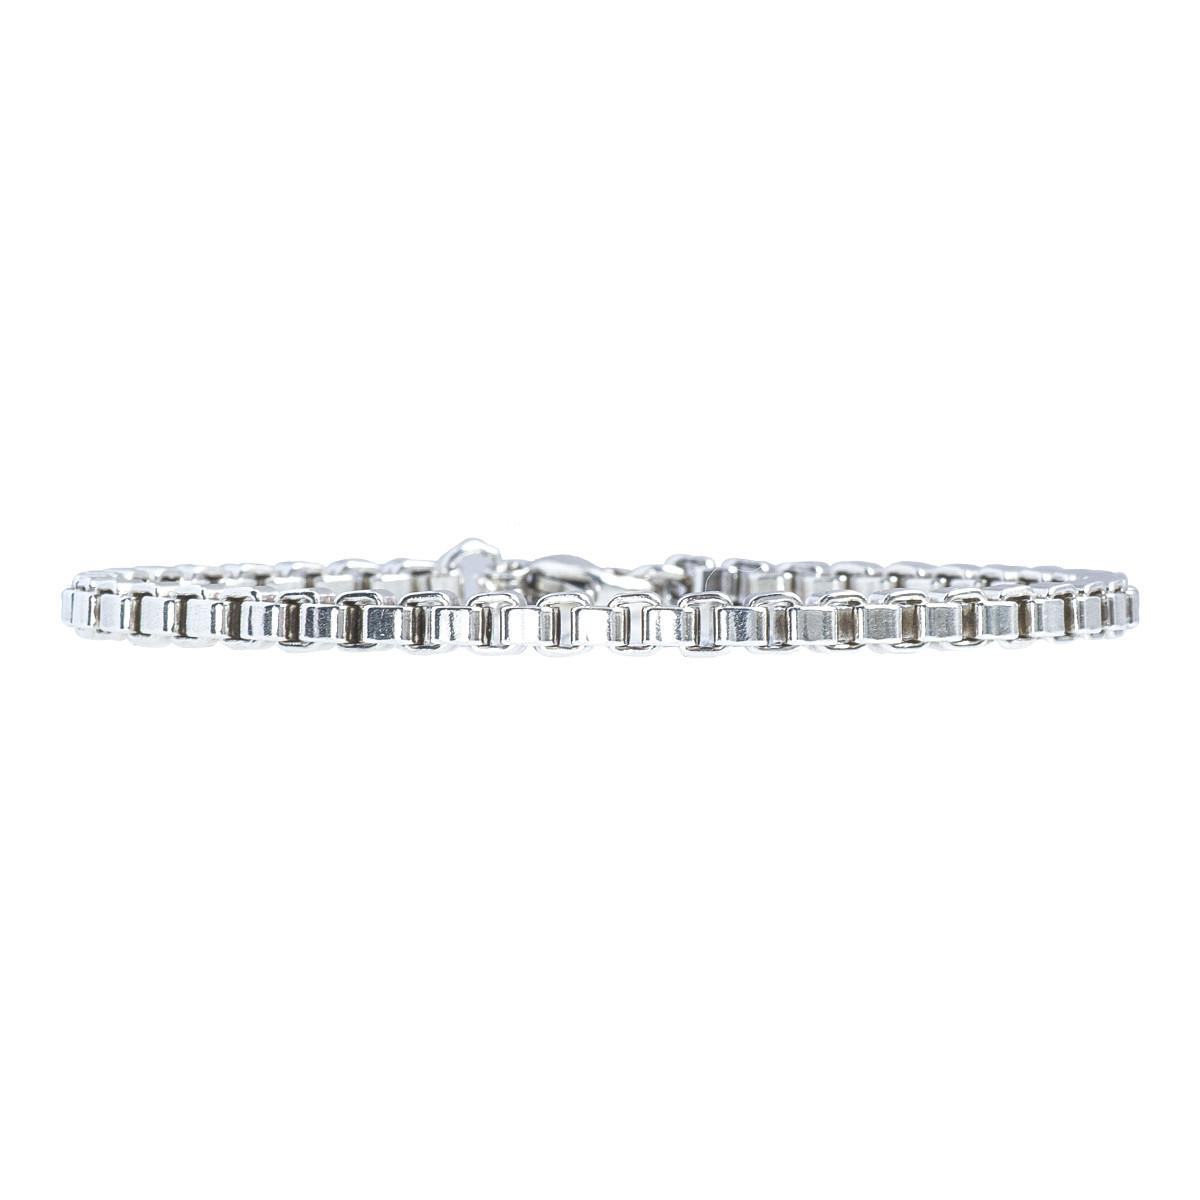 Vintage Tiffany & Co. Venetian Link Bracelet